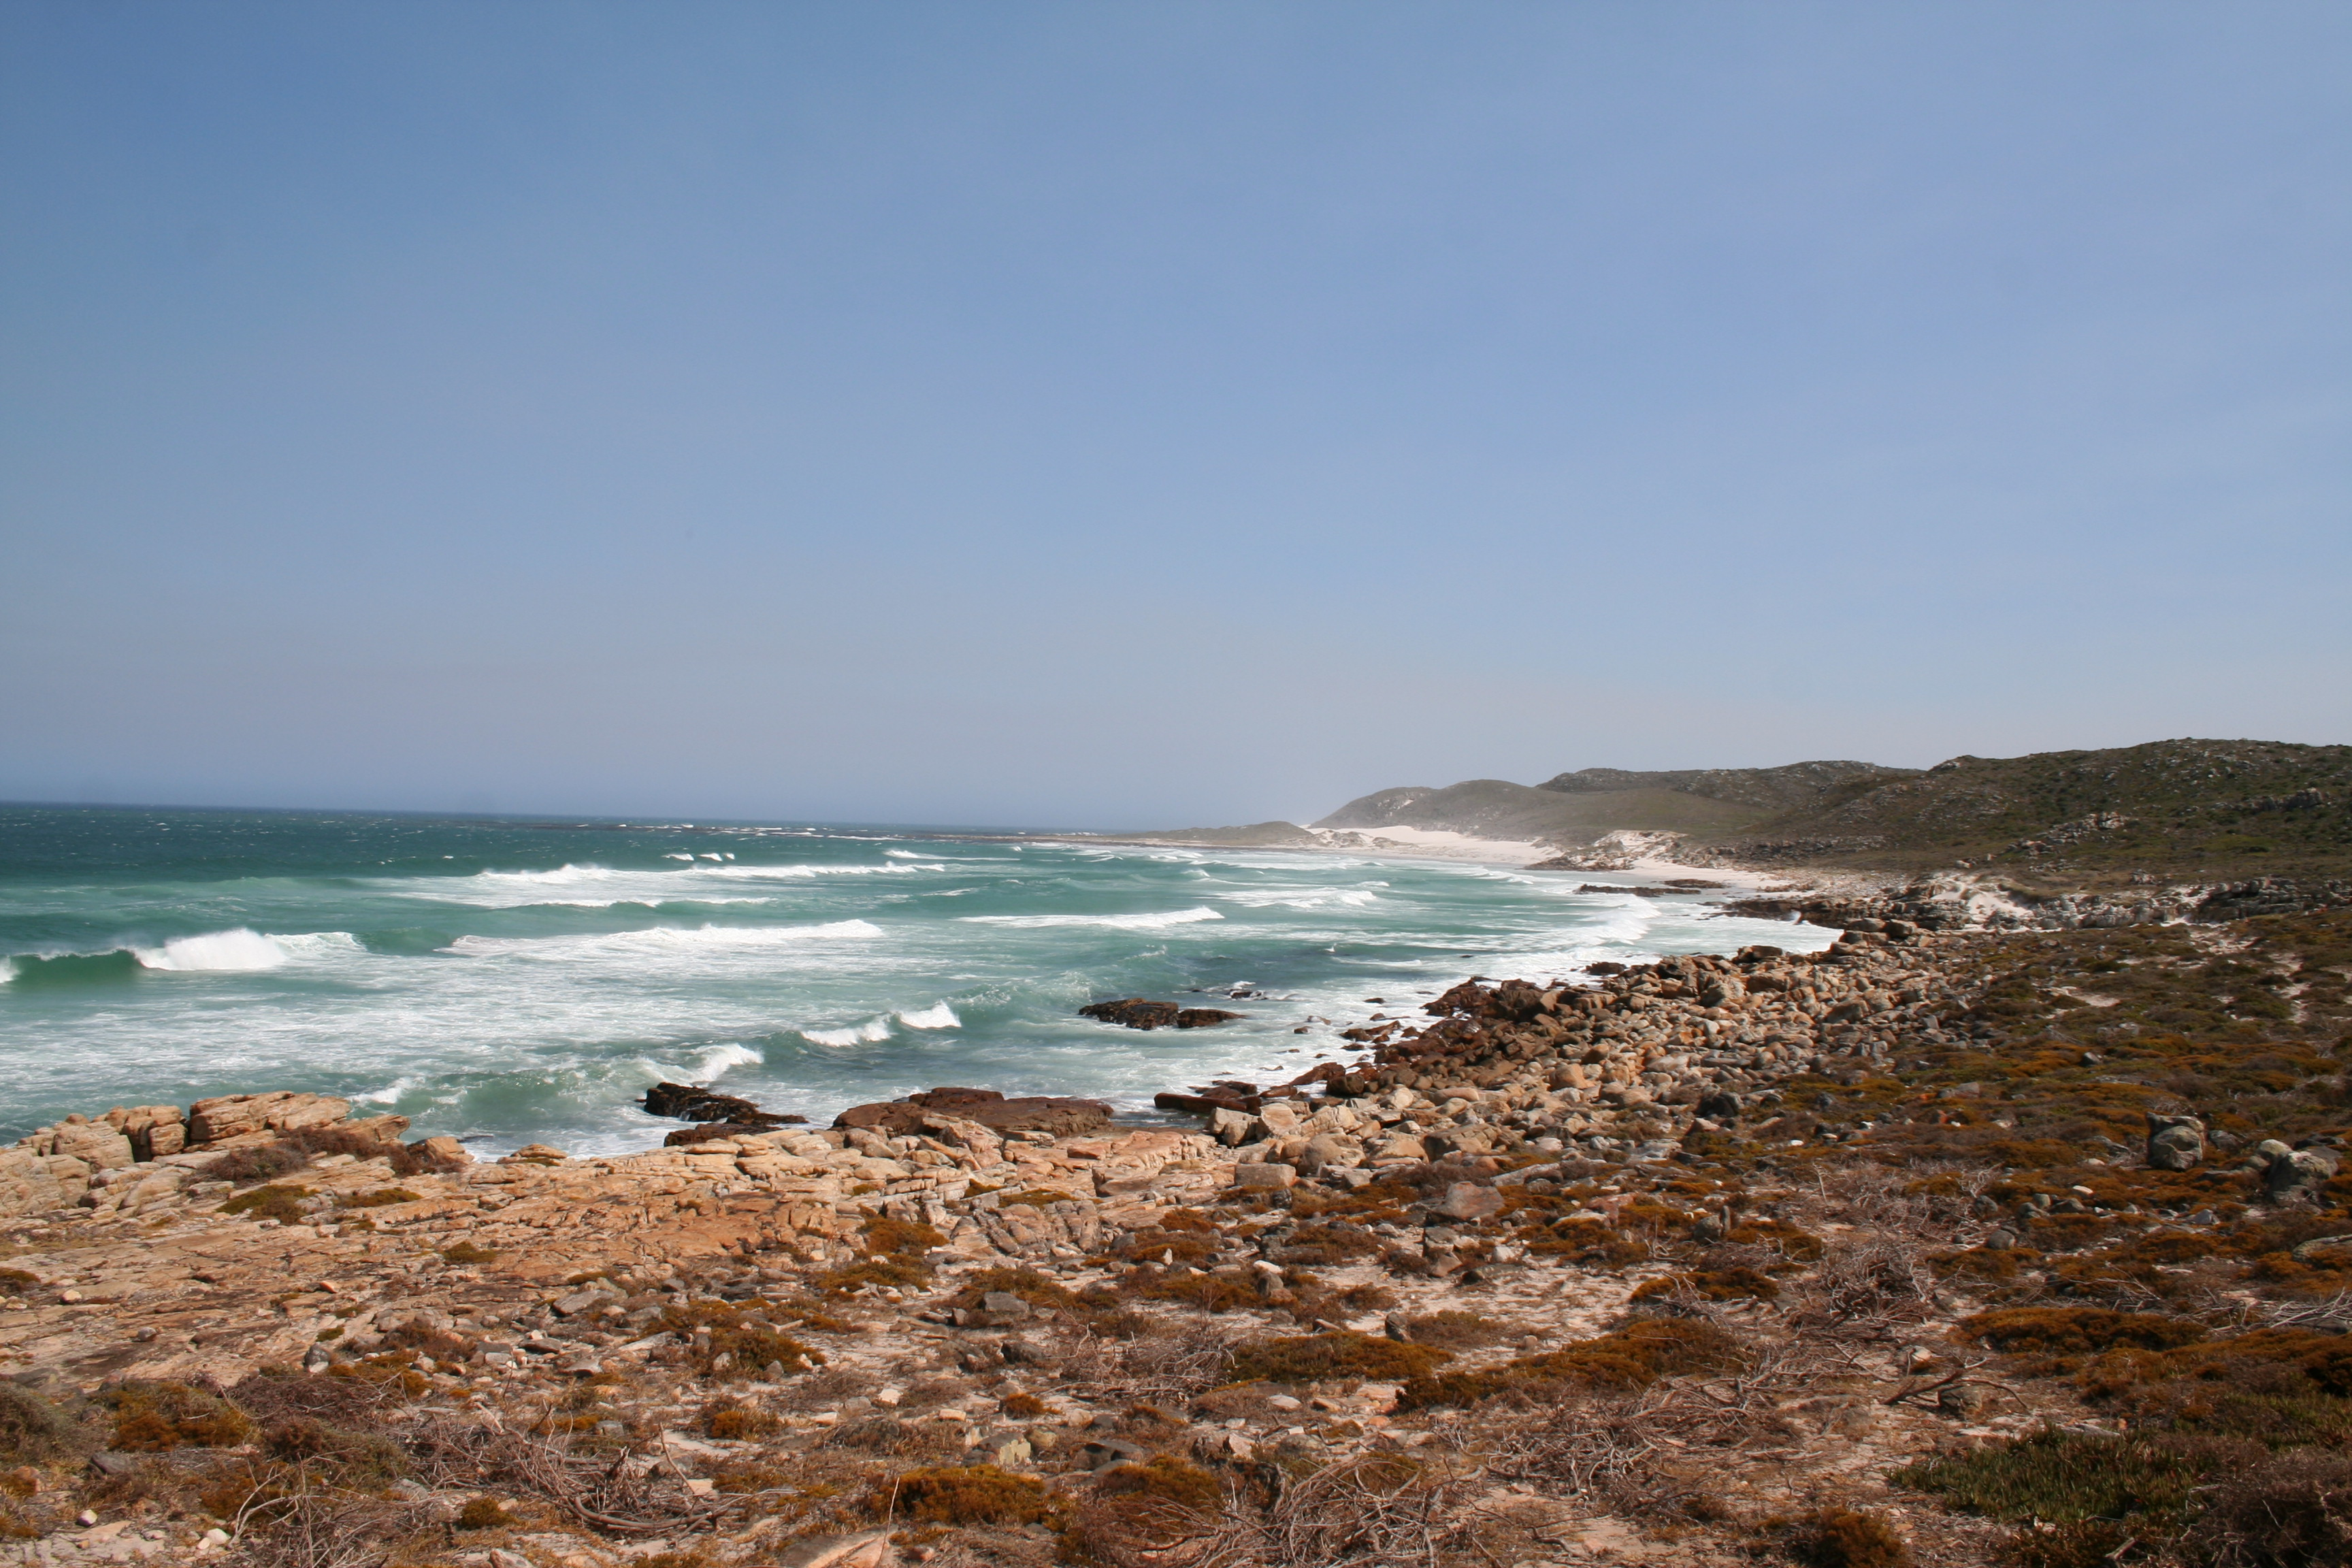 Cape of good hope photo